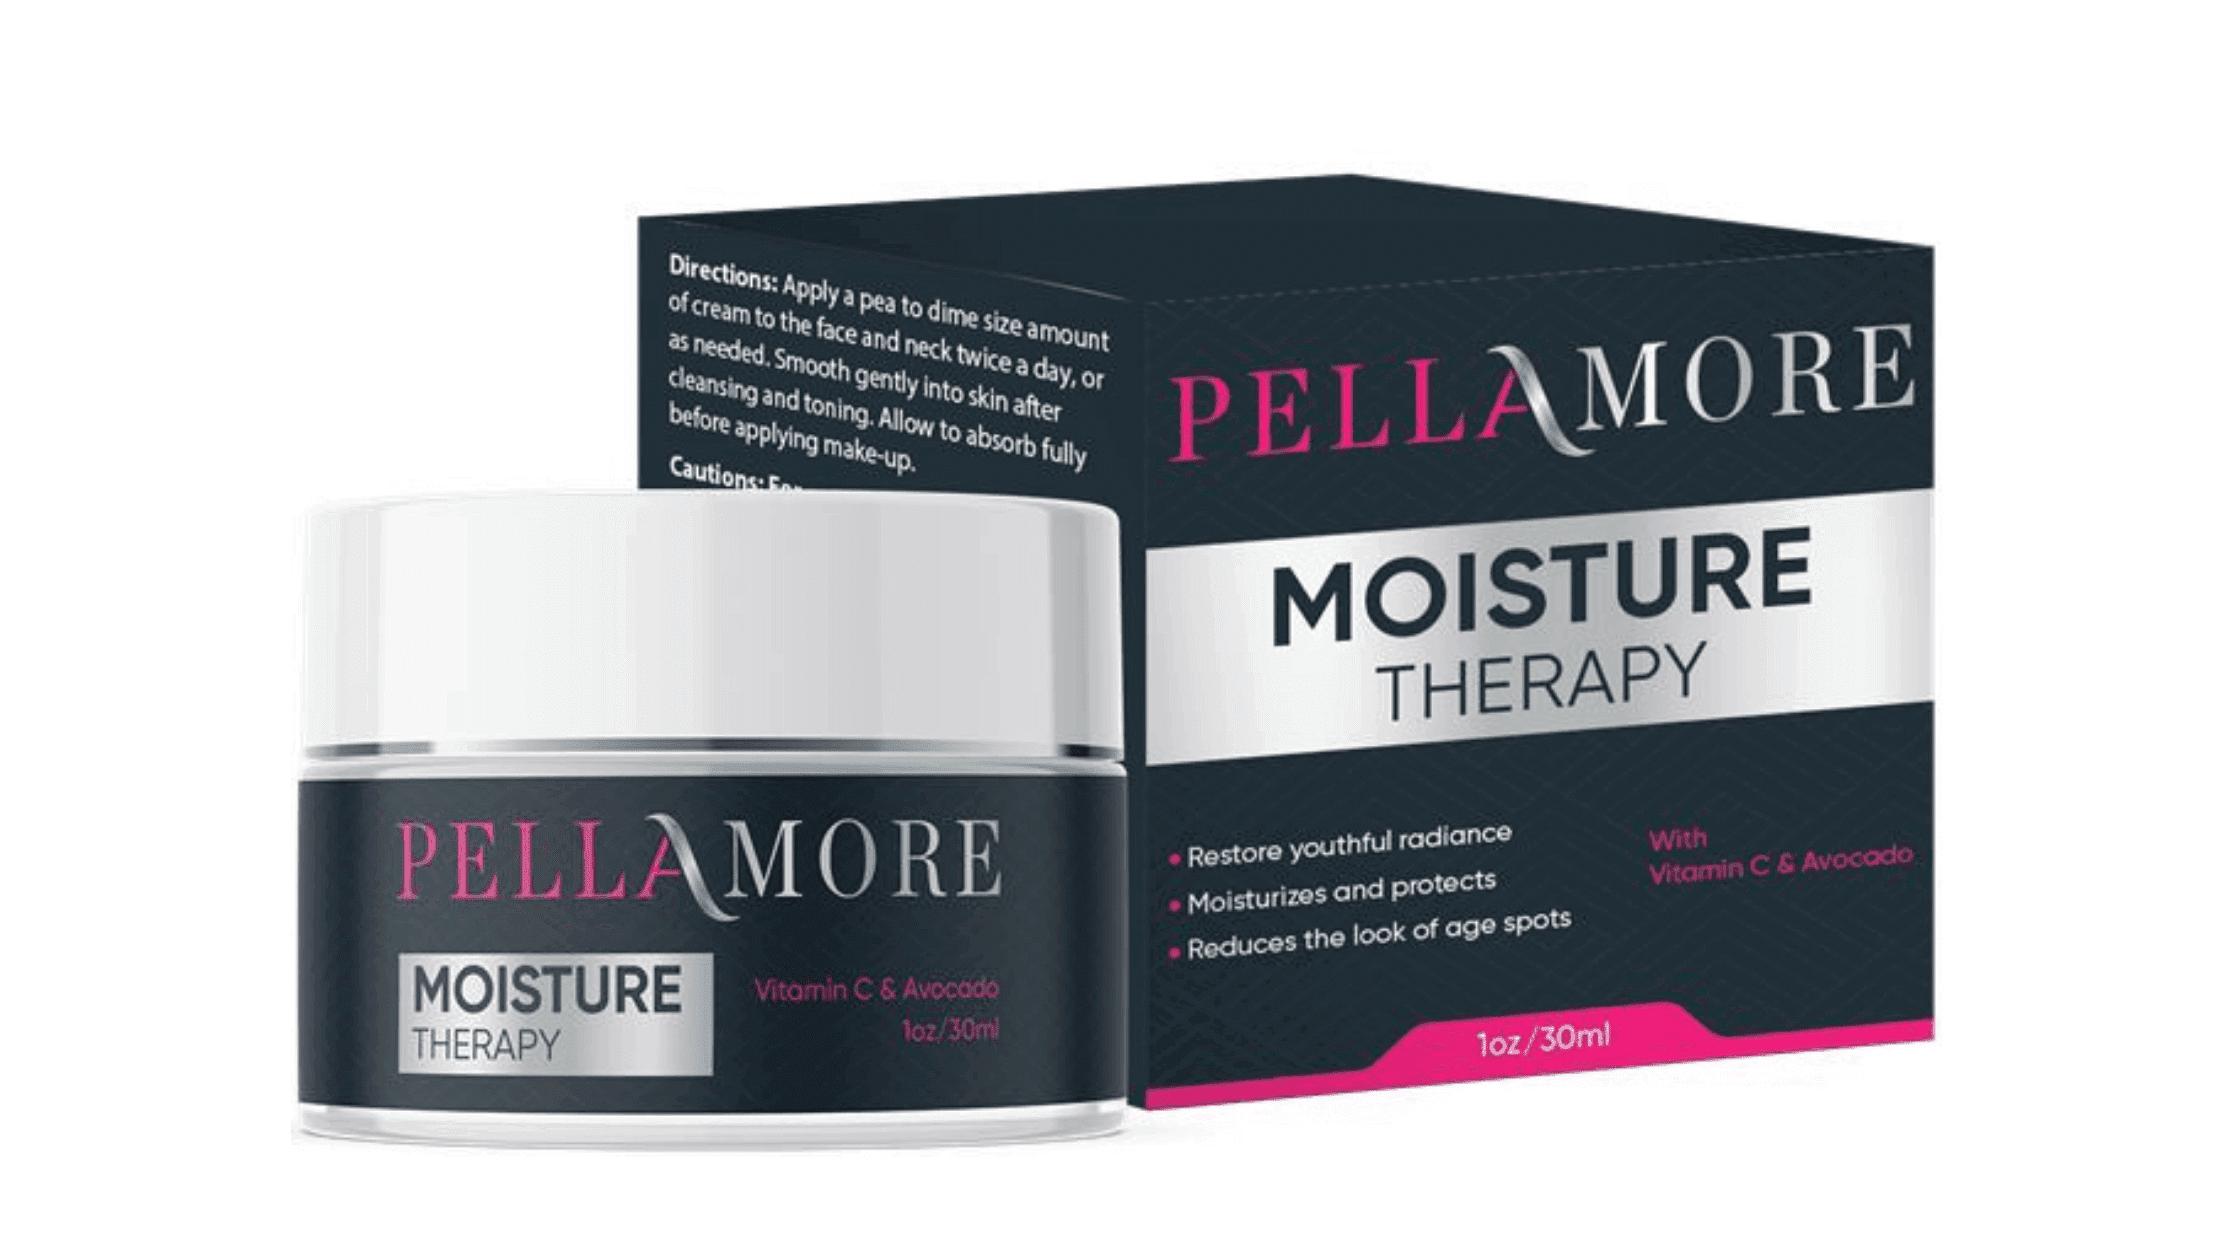 Pellamore Moisture Therapy Reviews